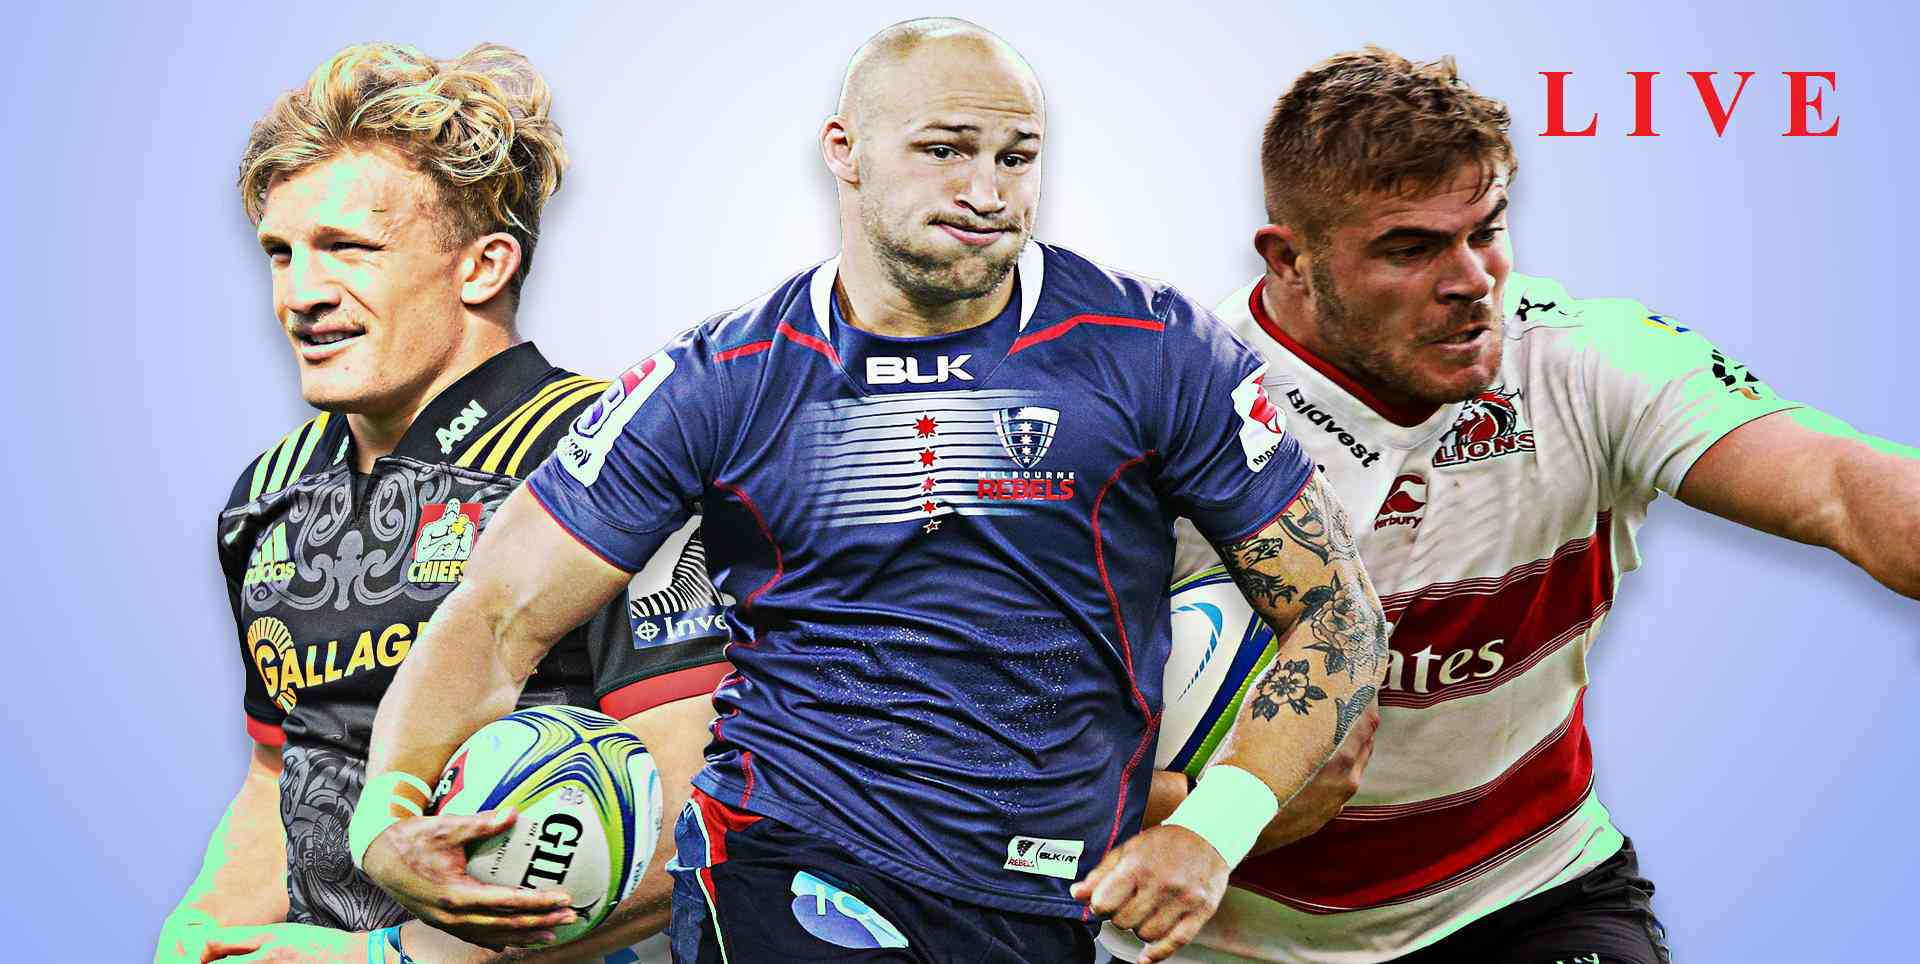 samoa-vs-romania-rugby-live